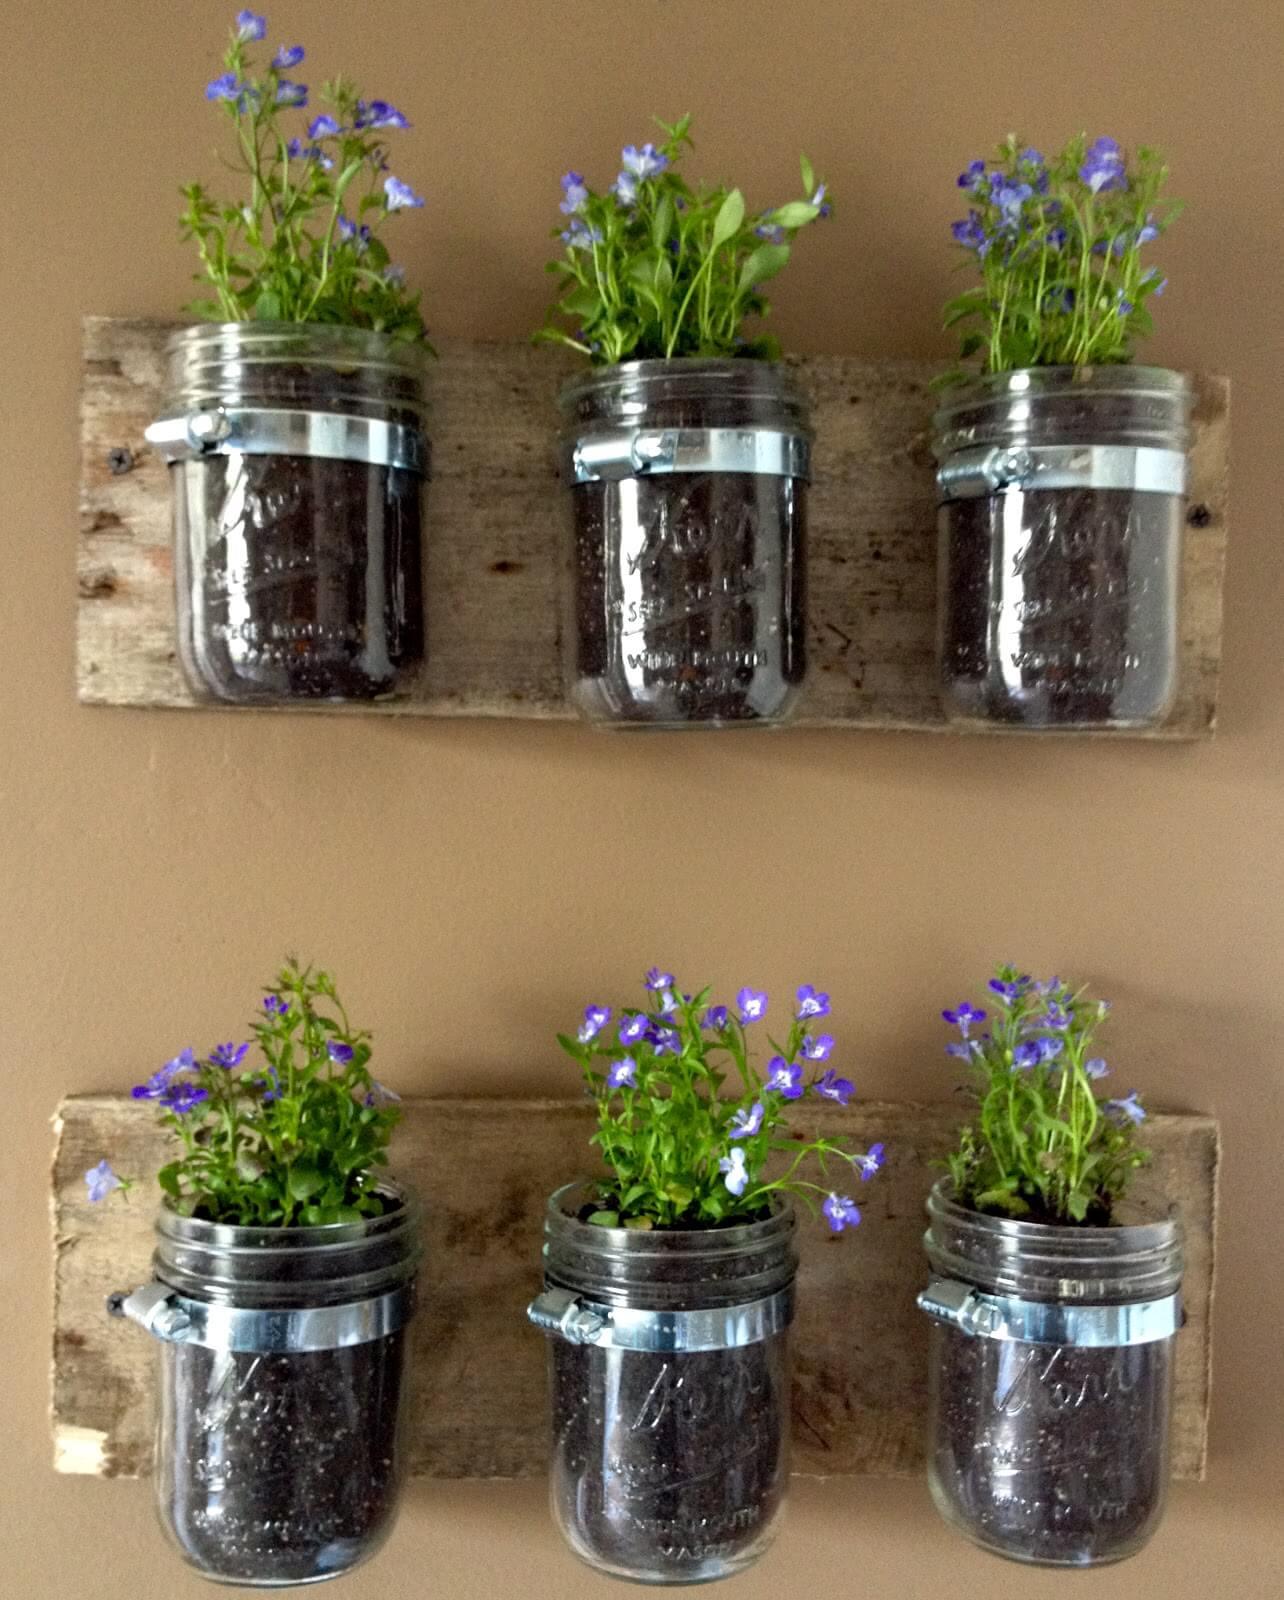 Hanging Mason Jars with Growing Flowers